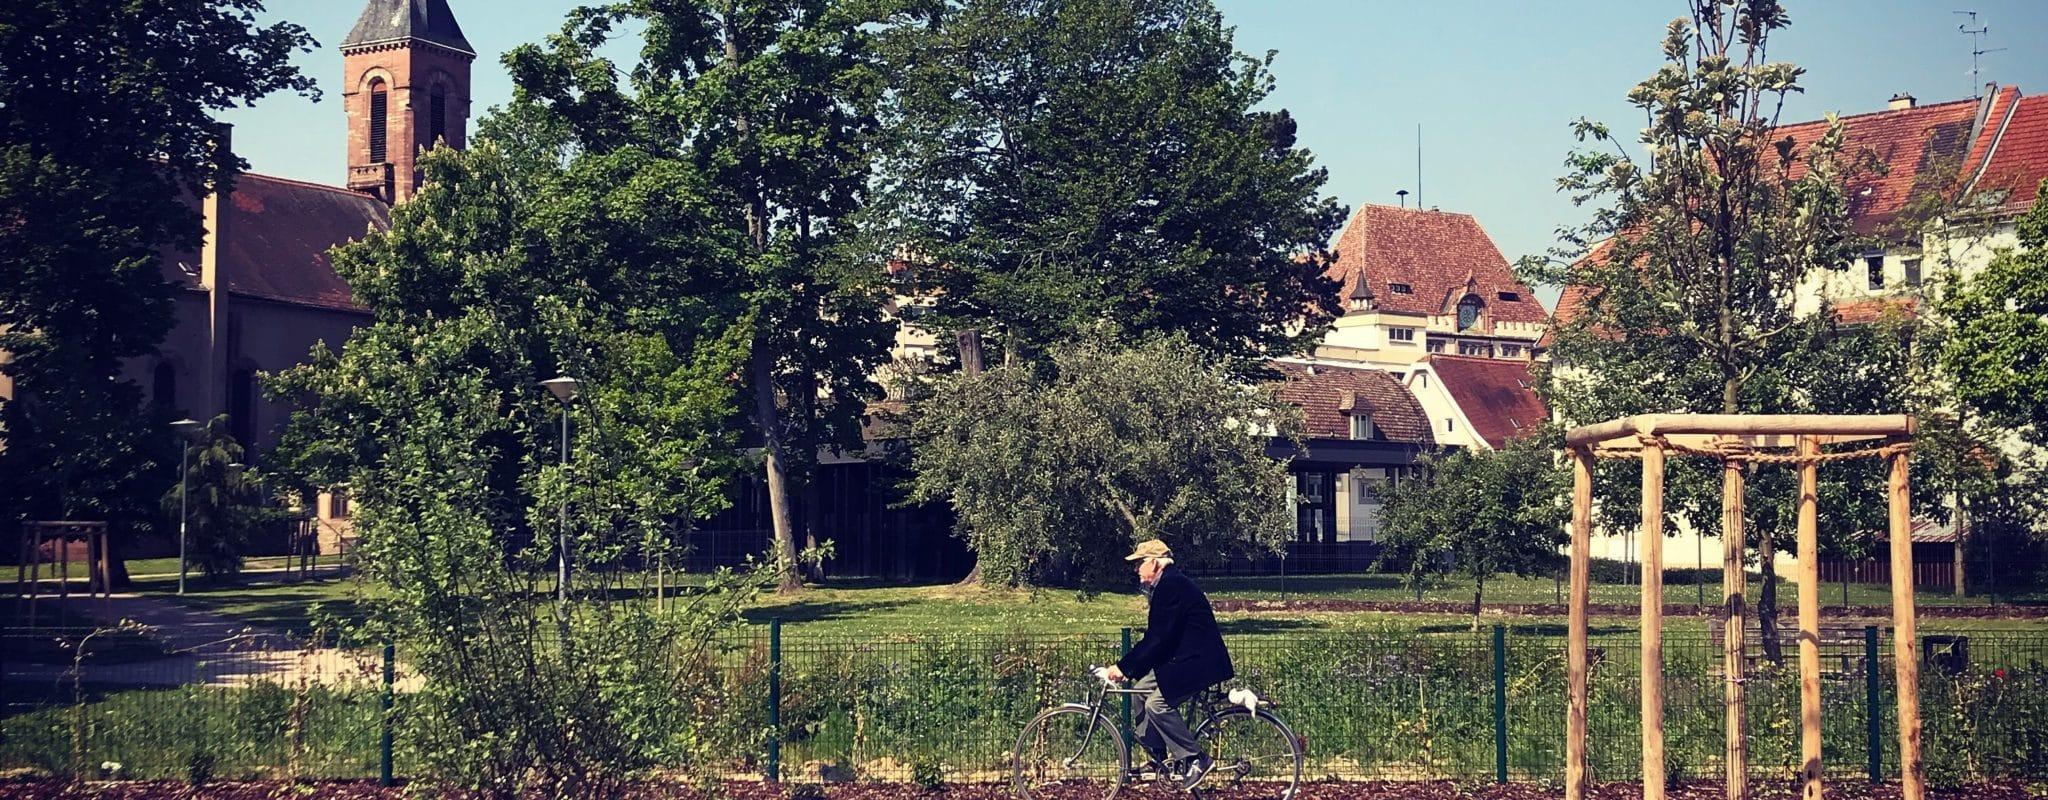 À la Robertsau, le «tram-jardin» s'arrête à mi-chemin